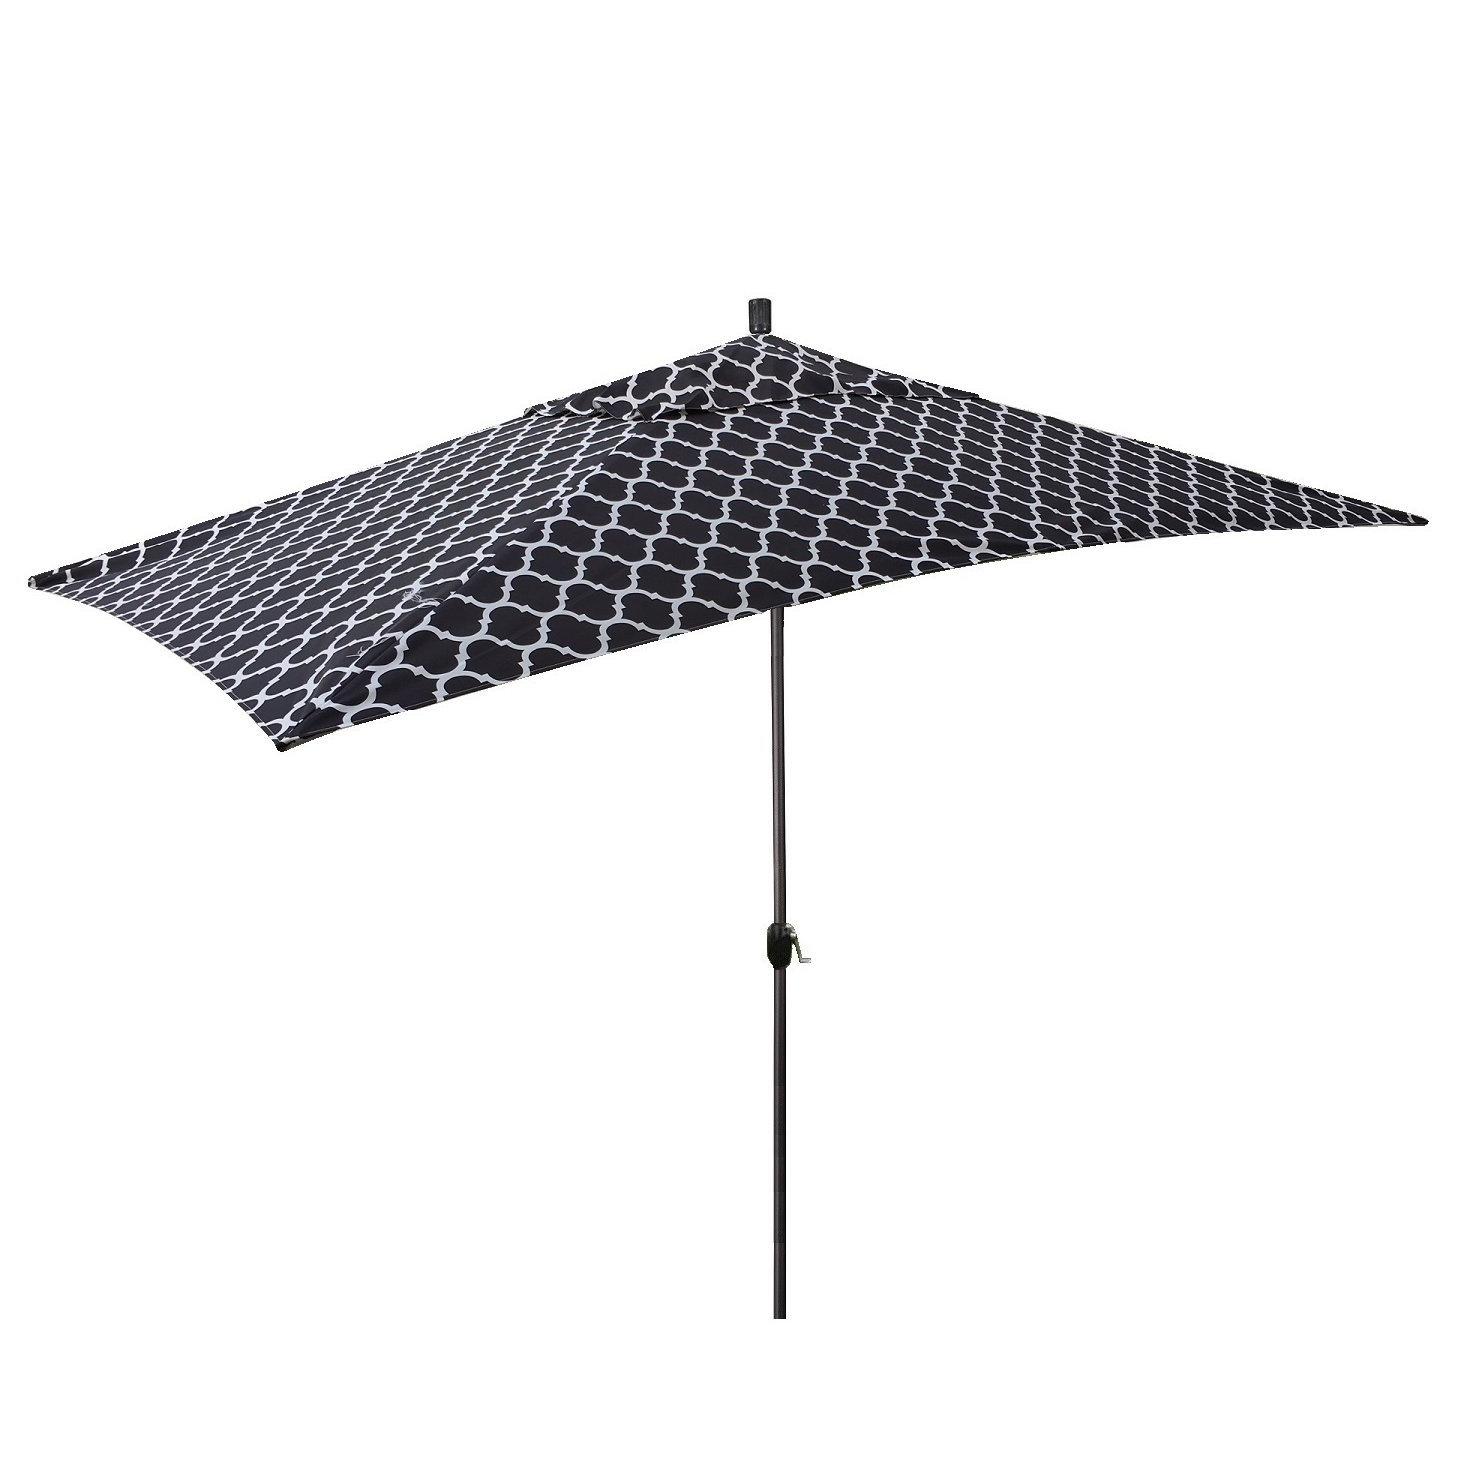 Sherlyn 10' X 6' Rectangular Market Umbrella Pertaining To Popular Devansh Market Umbrellas (View 19 of 20)